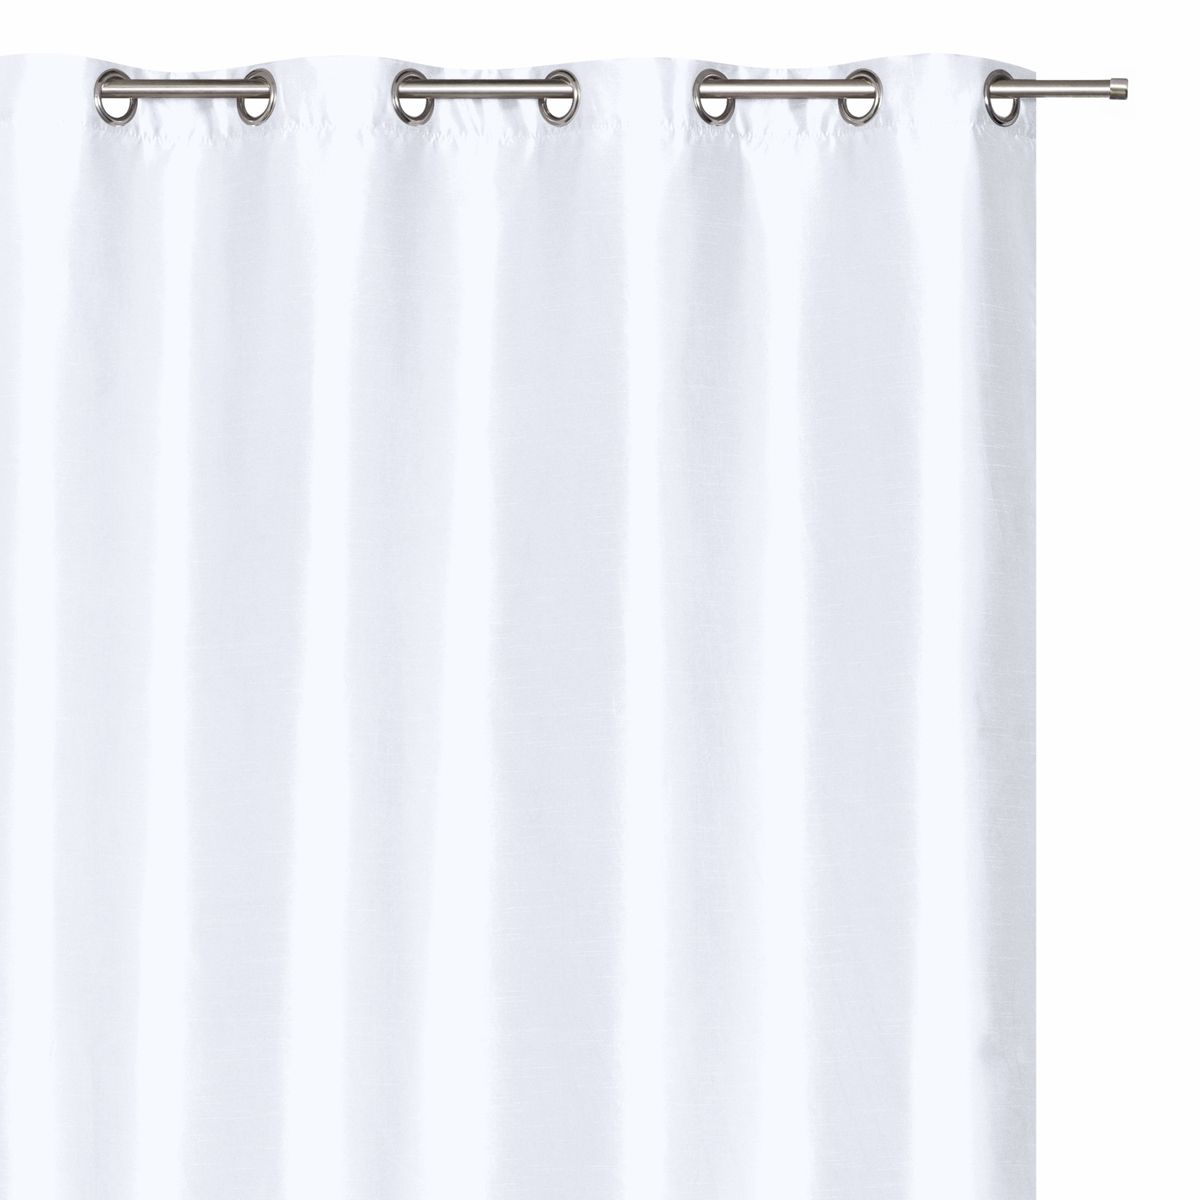 Rideau effet soie blanc Torreon 140x240 cm